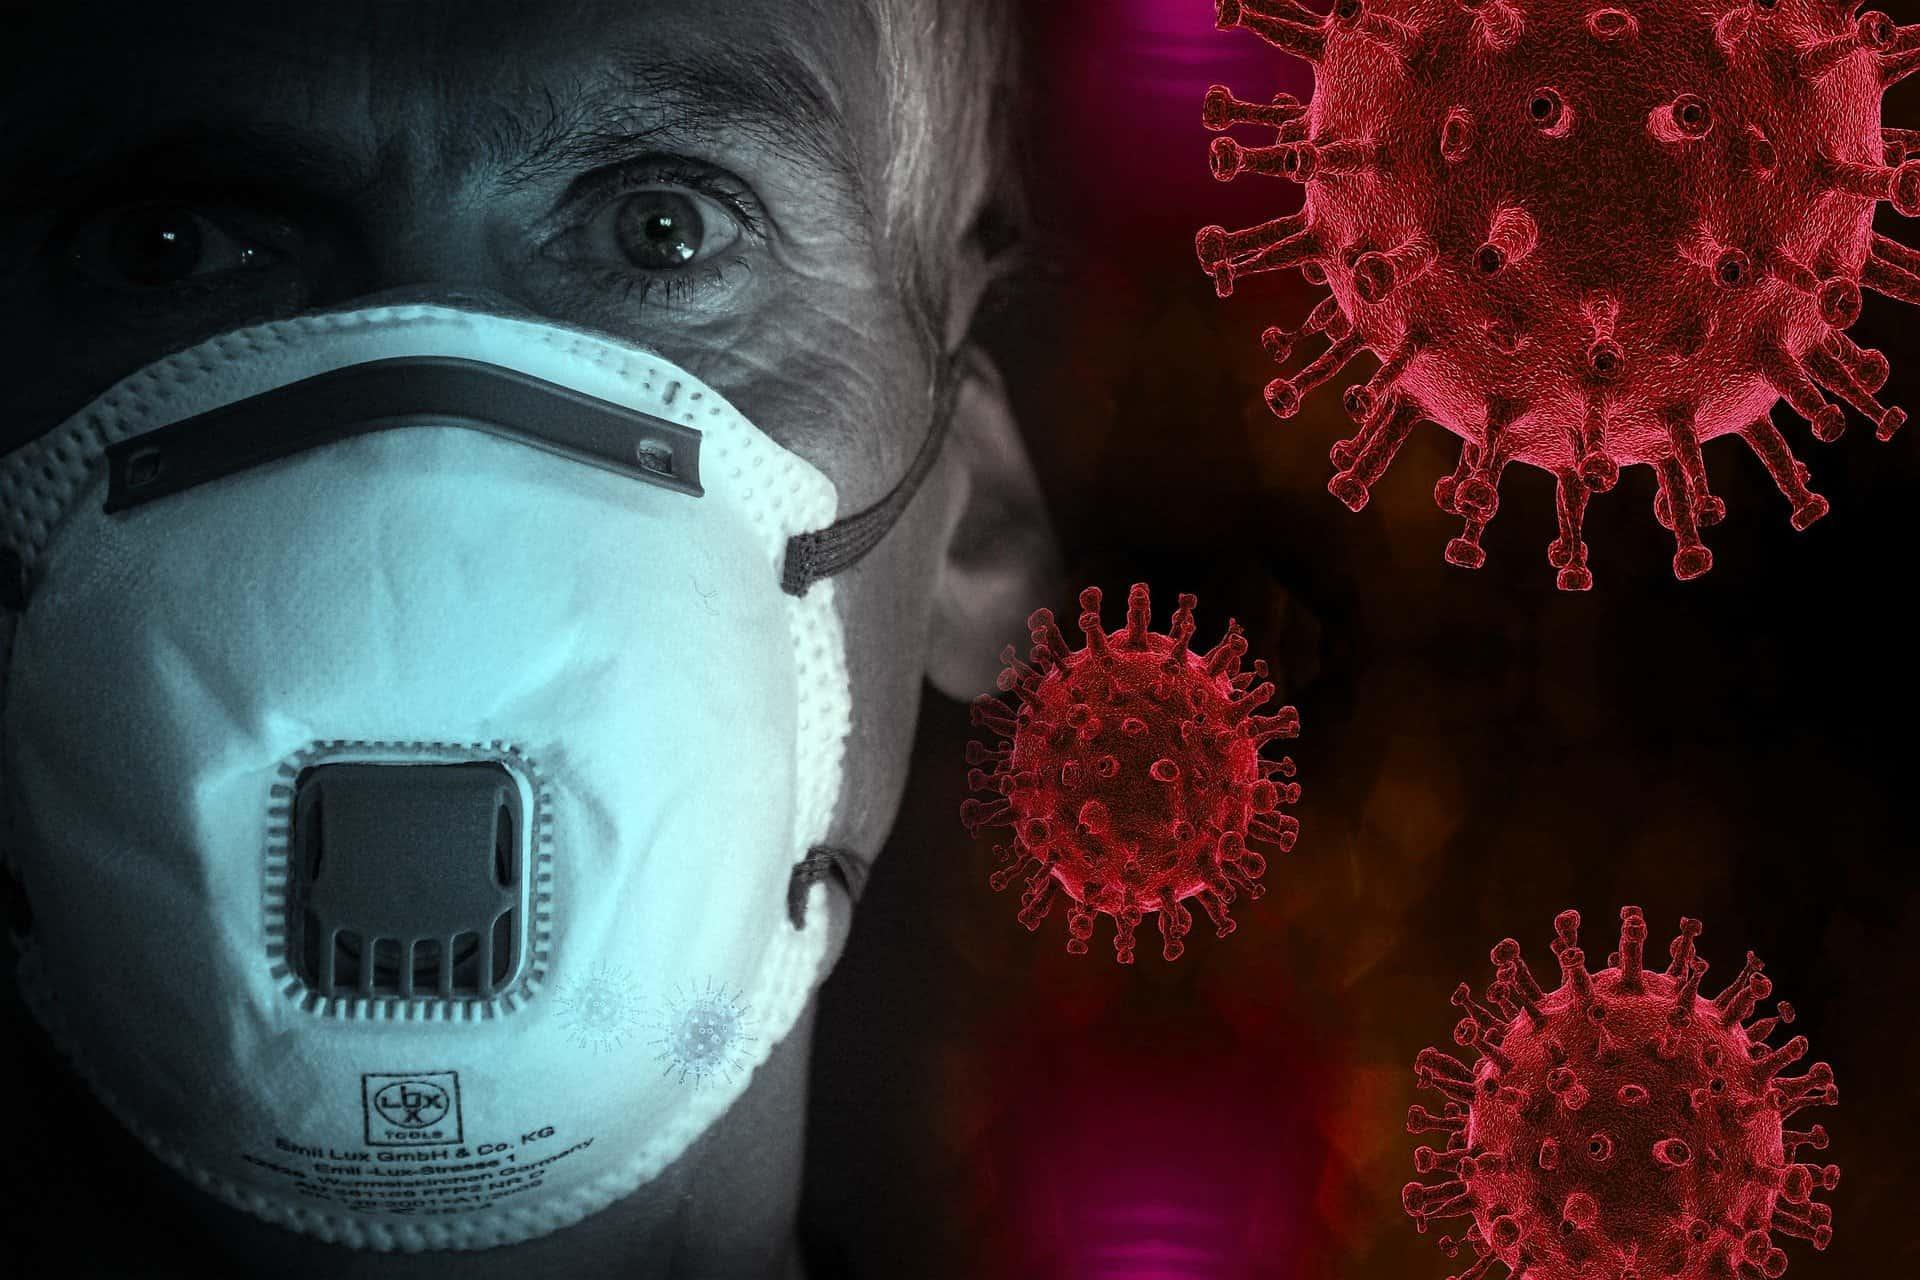 Covid-19 Corona Virus 21 Day Lockdown